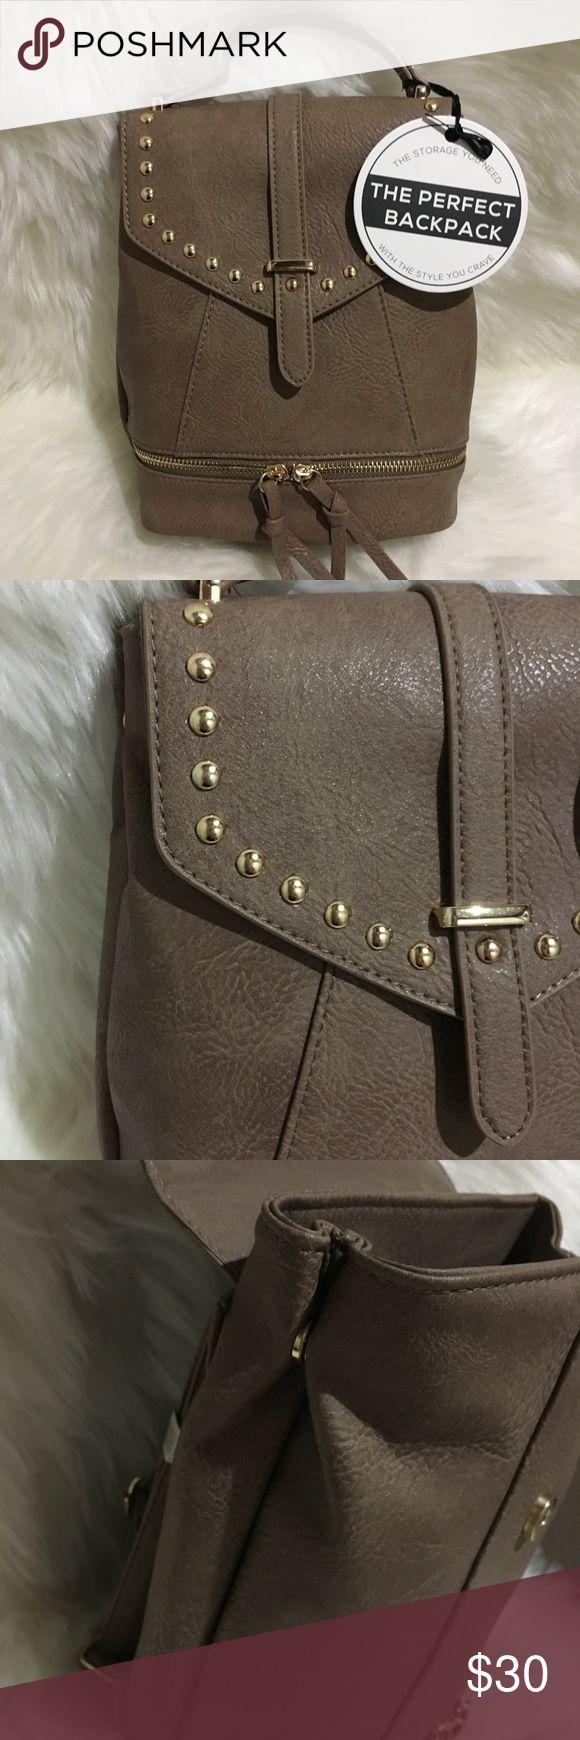 Brown beige gold Studded Backpack purse tassel Brown tan khaki gold studded backpack purse handbag under one sky the perfect backpack. Adjustable straps Bags Backpacks